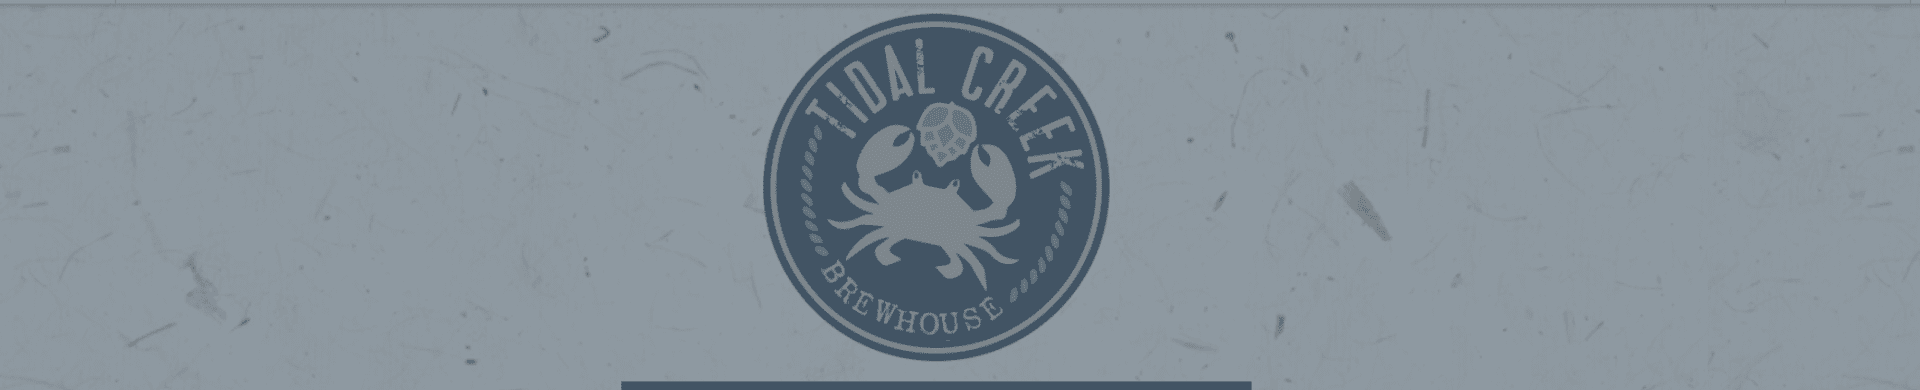 tidal creek logo from tidal creek times